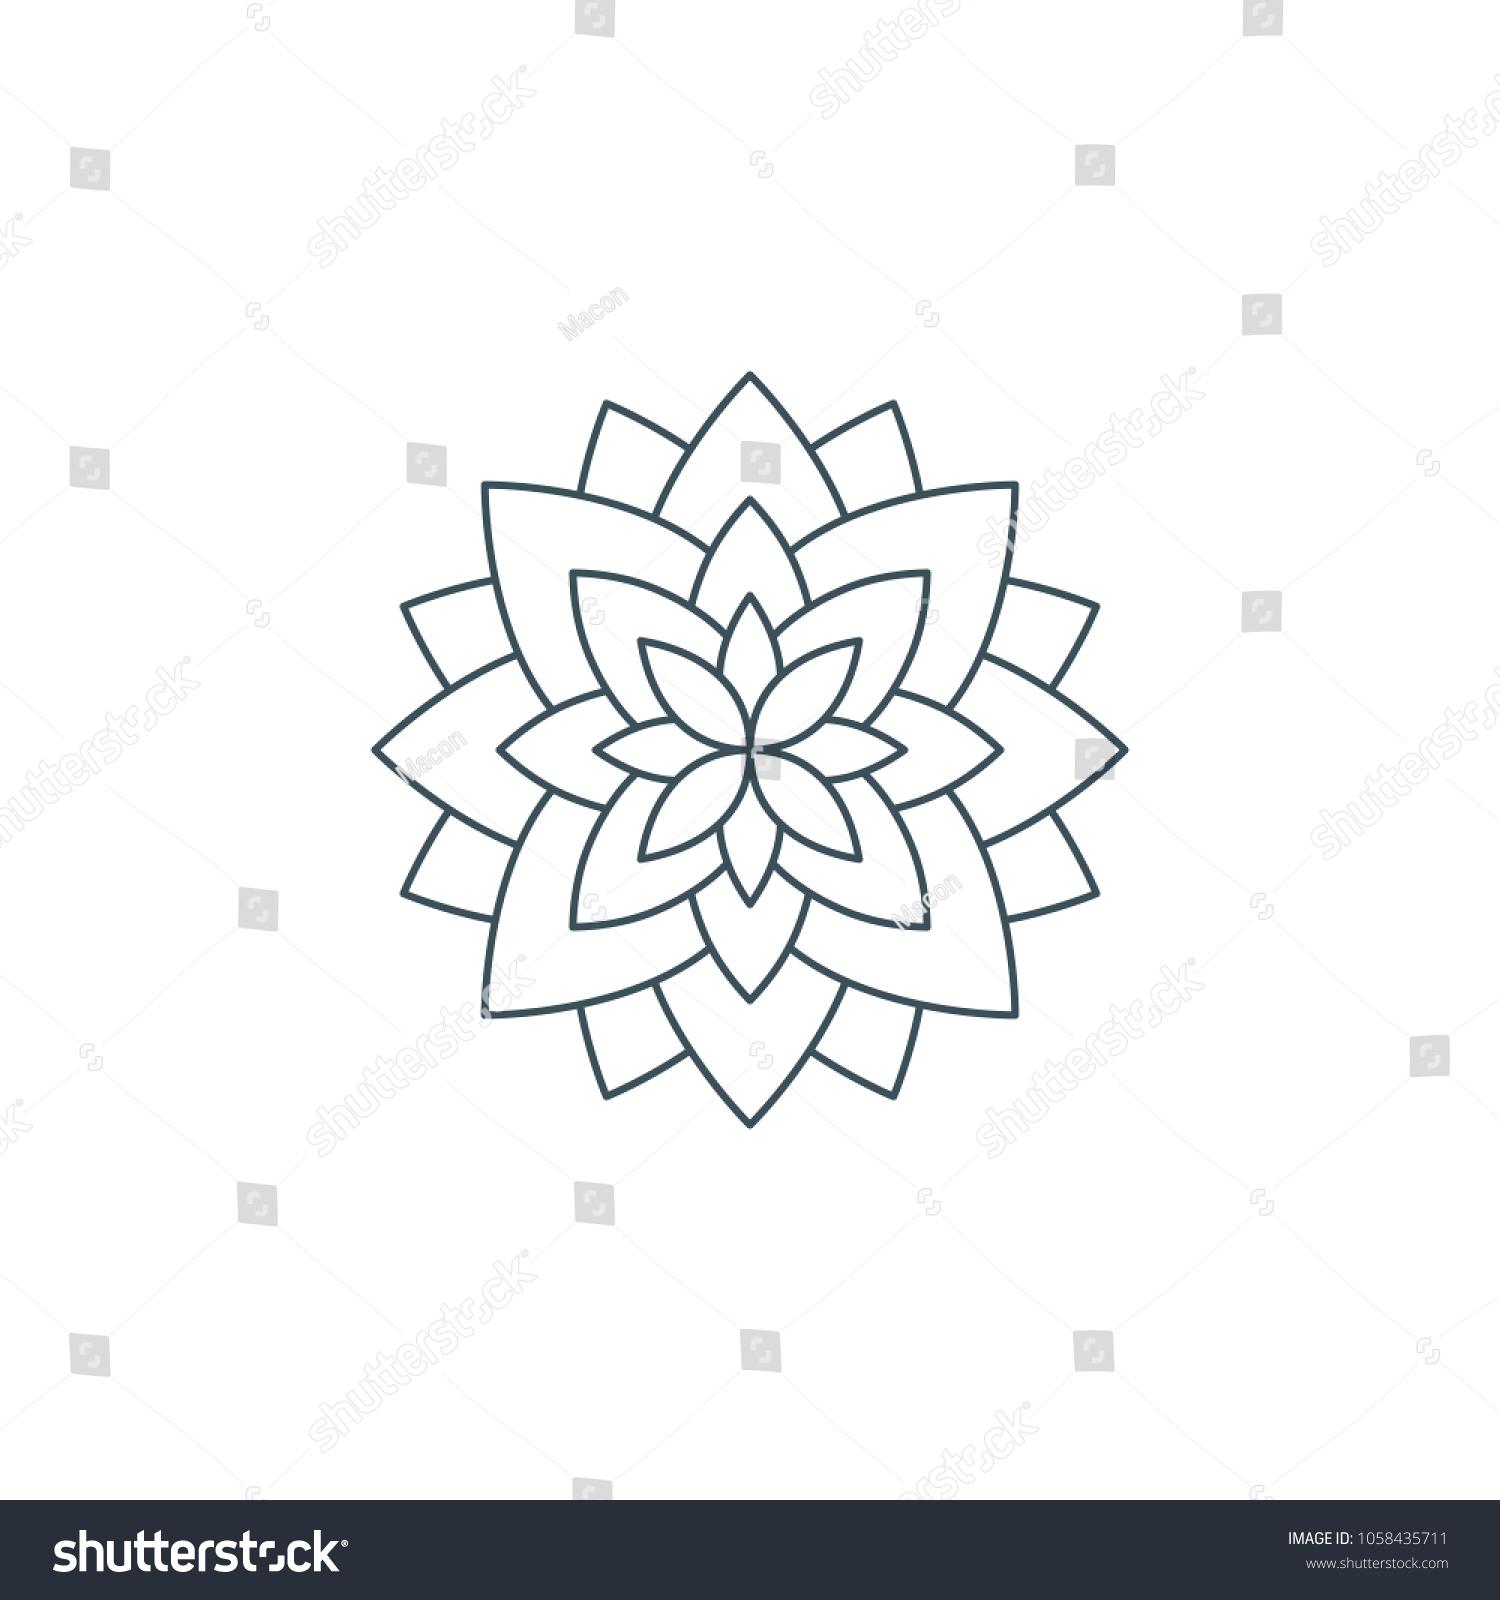 Line lotus flower flower life sacred stock illustration 1058435711 line lotus flower or flower of life sacred geometry mandala ornament esoteric or izmirmasajfo